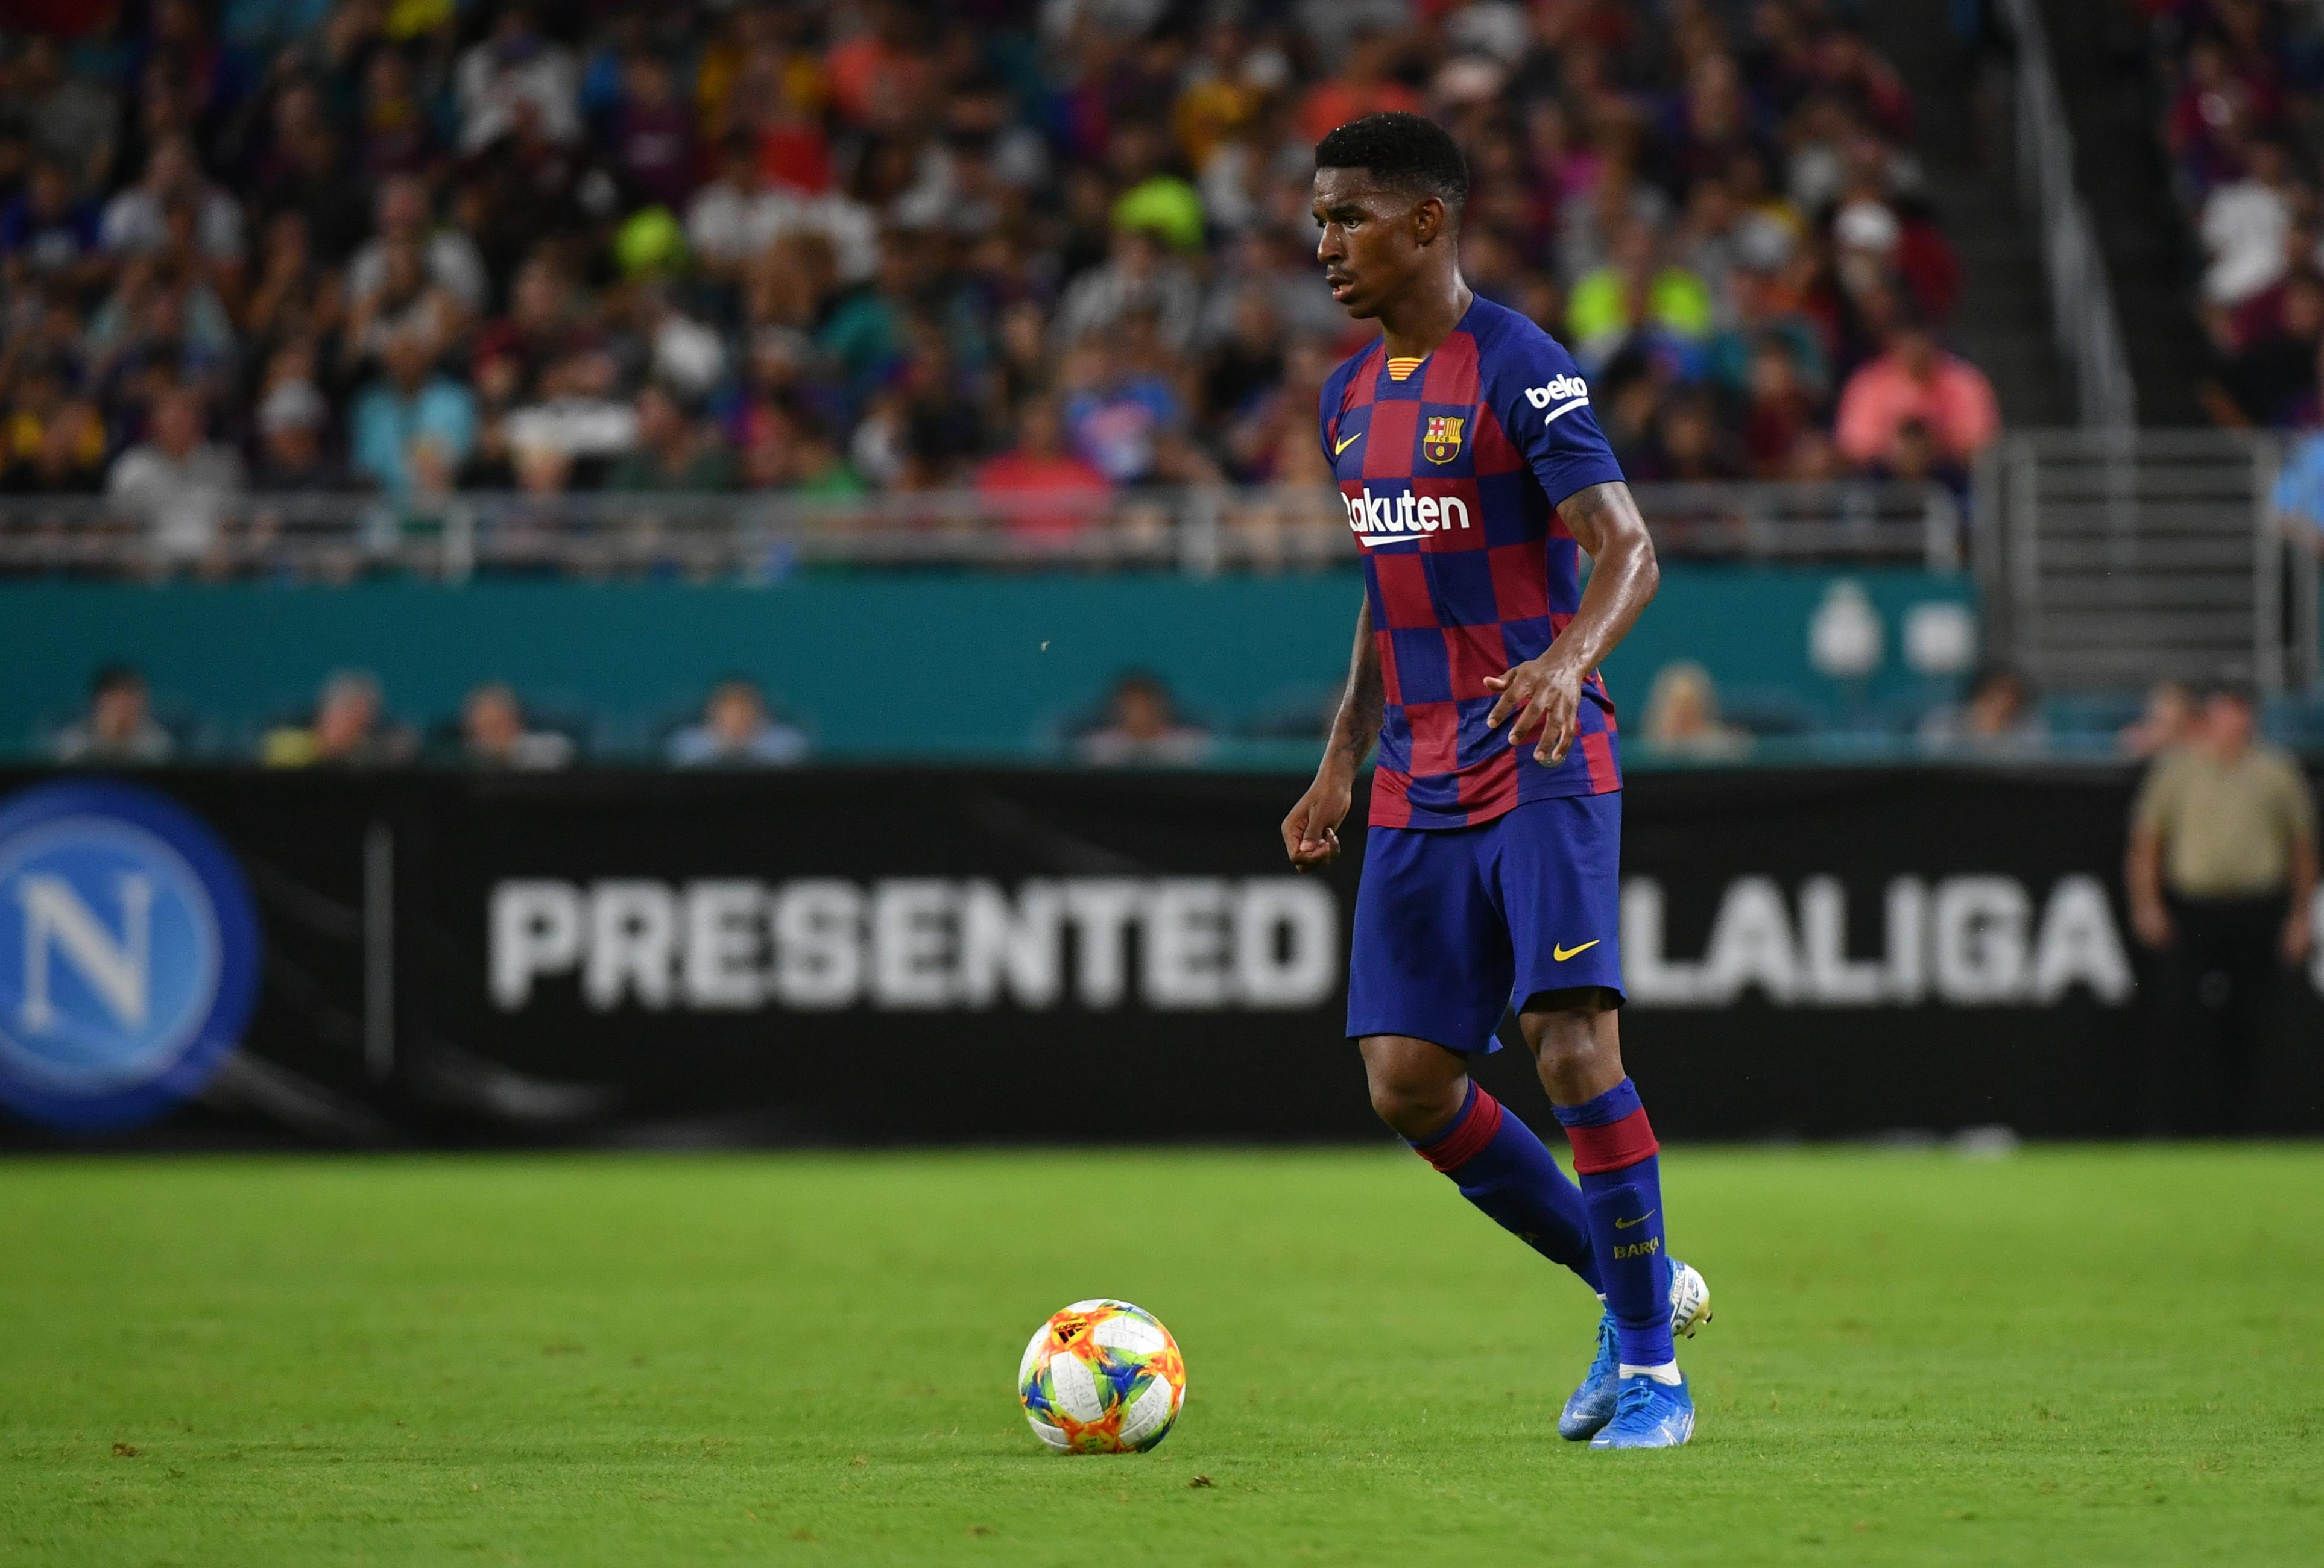 Barca Blaugranes Archives - Barcelona: Transfer Rumors